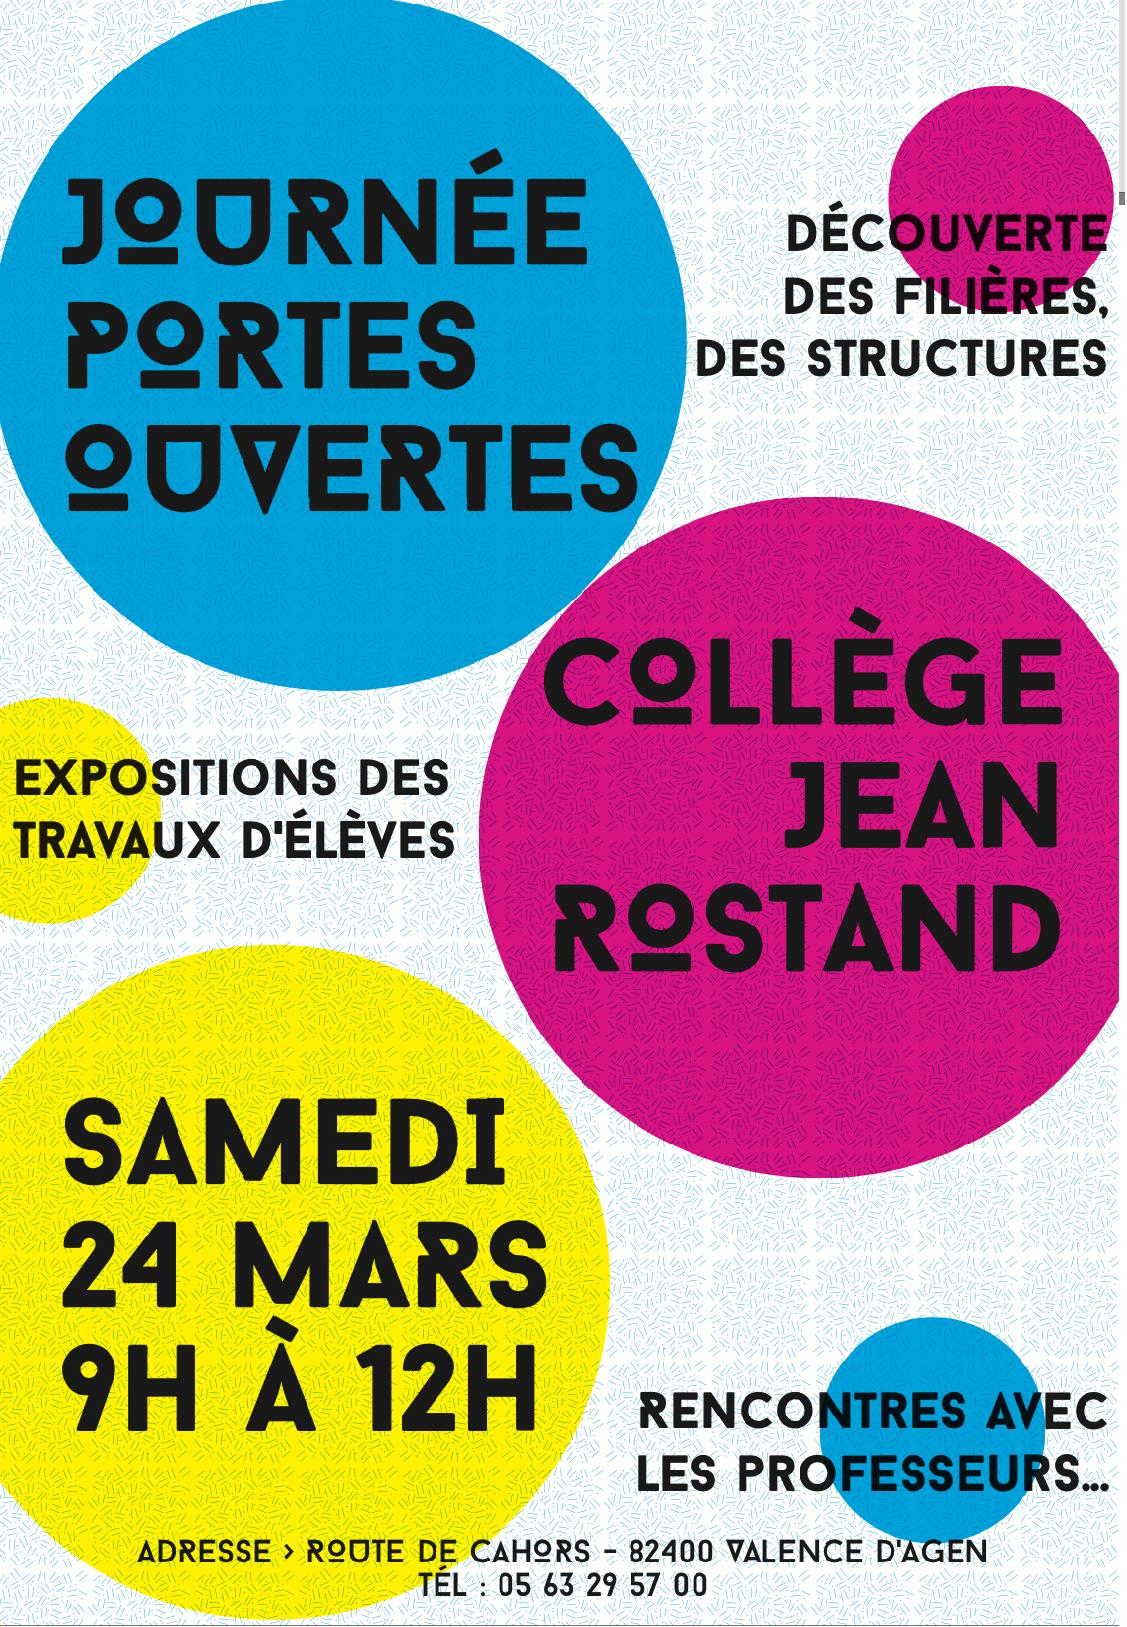 Blog - Accueil - Collège Jean Rostand